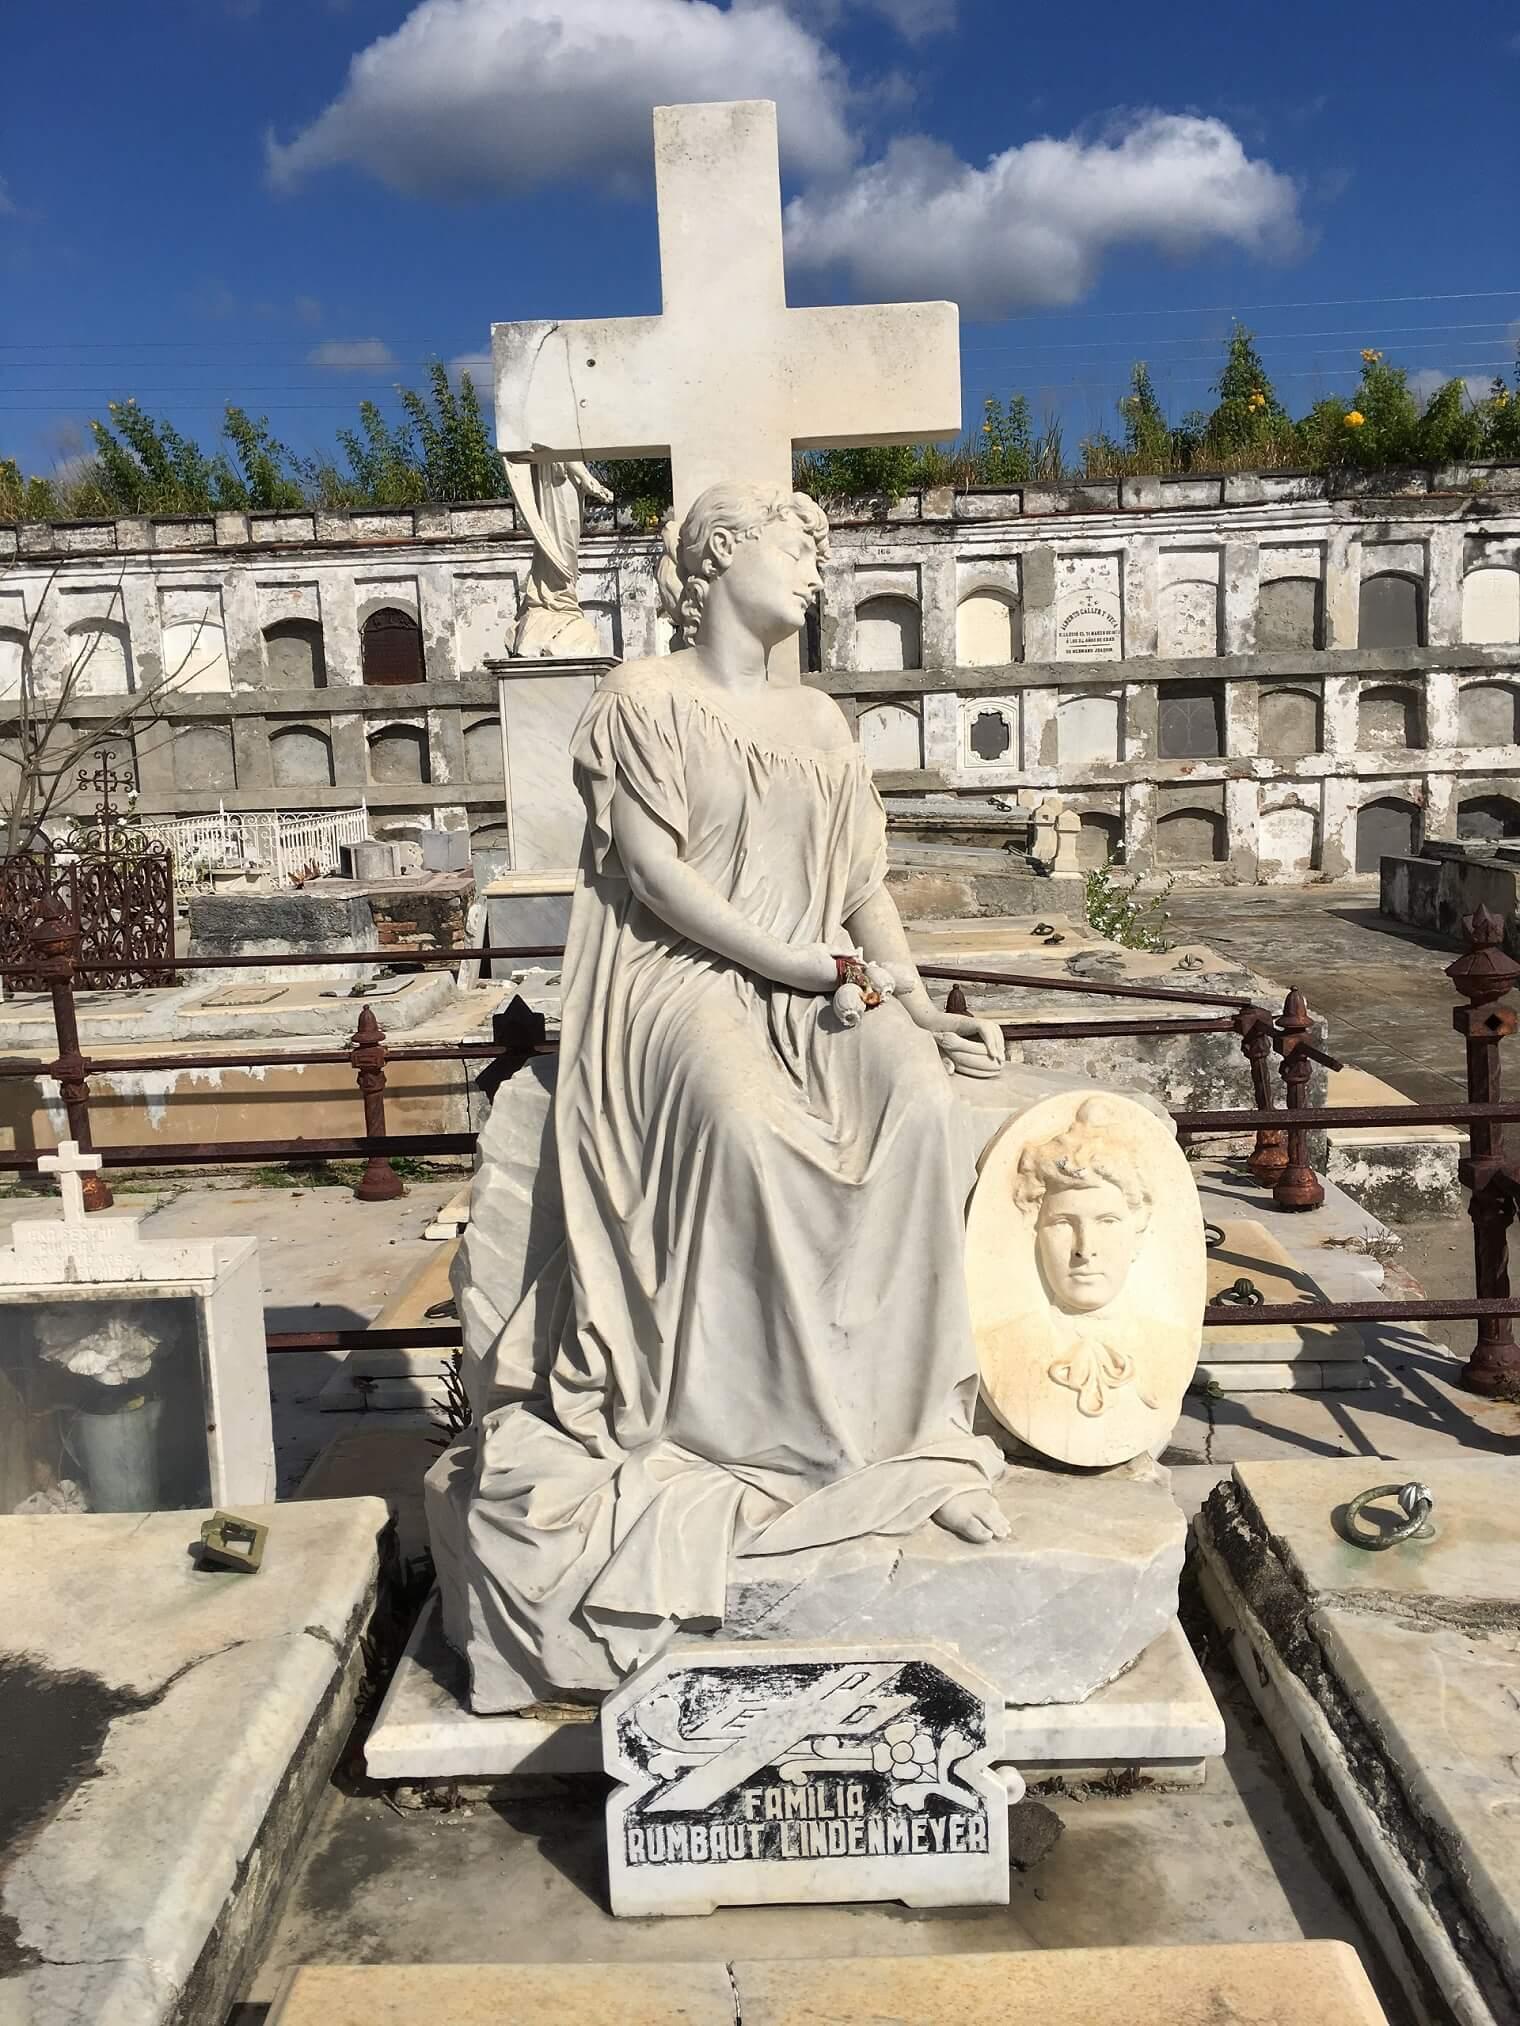 Sleeping Beauty: Things to Do in Cienfuegos